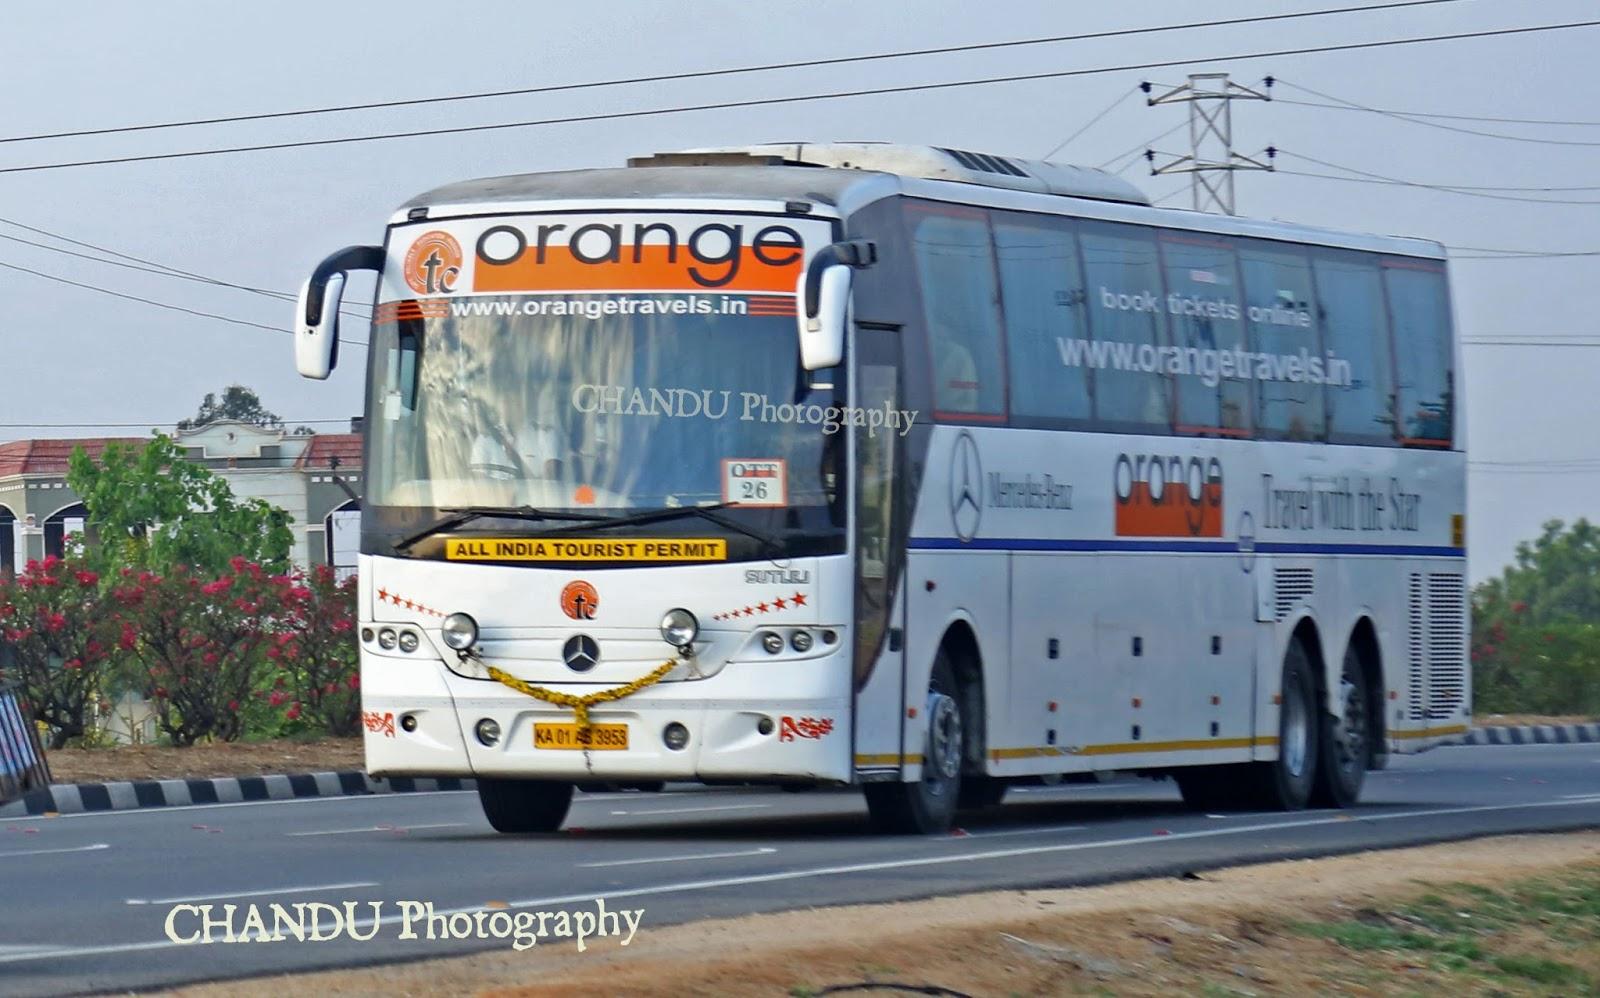 chanduphotography: Orange travels